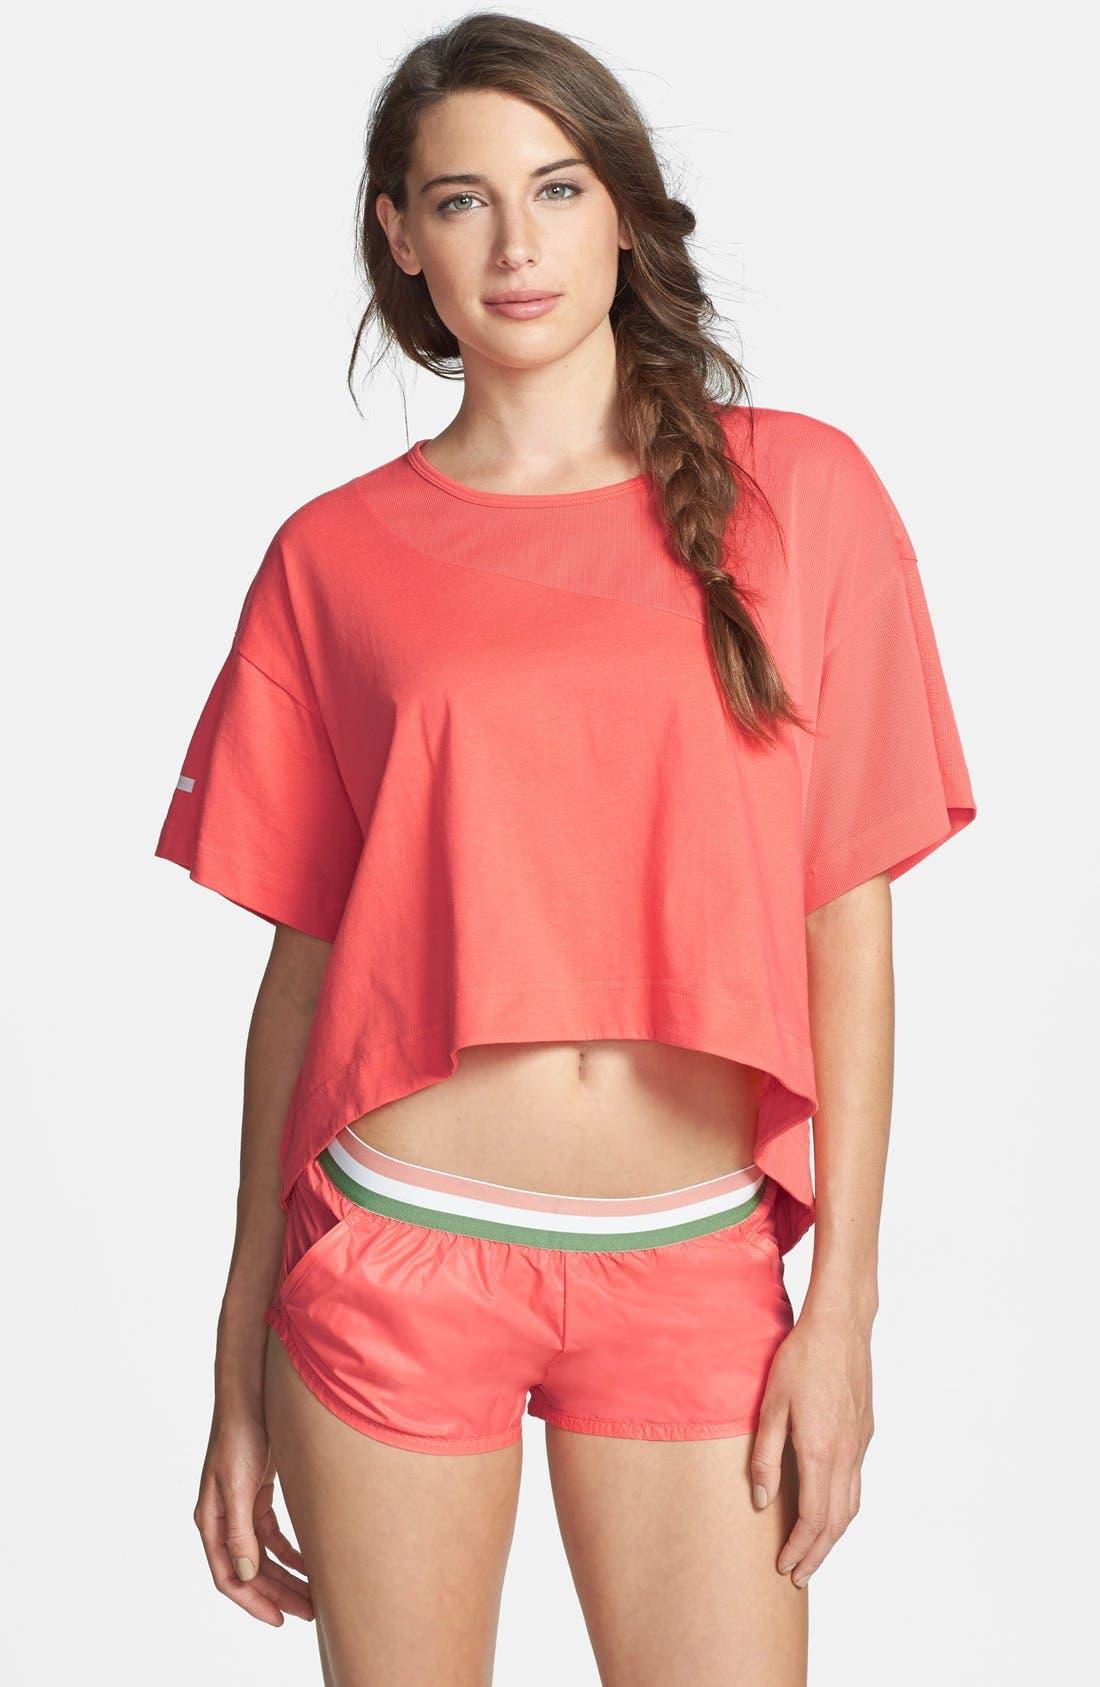 Main Image - adidas by Stella McCartney 'Yoga Loose' High/Low Crop Tee